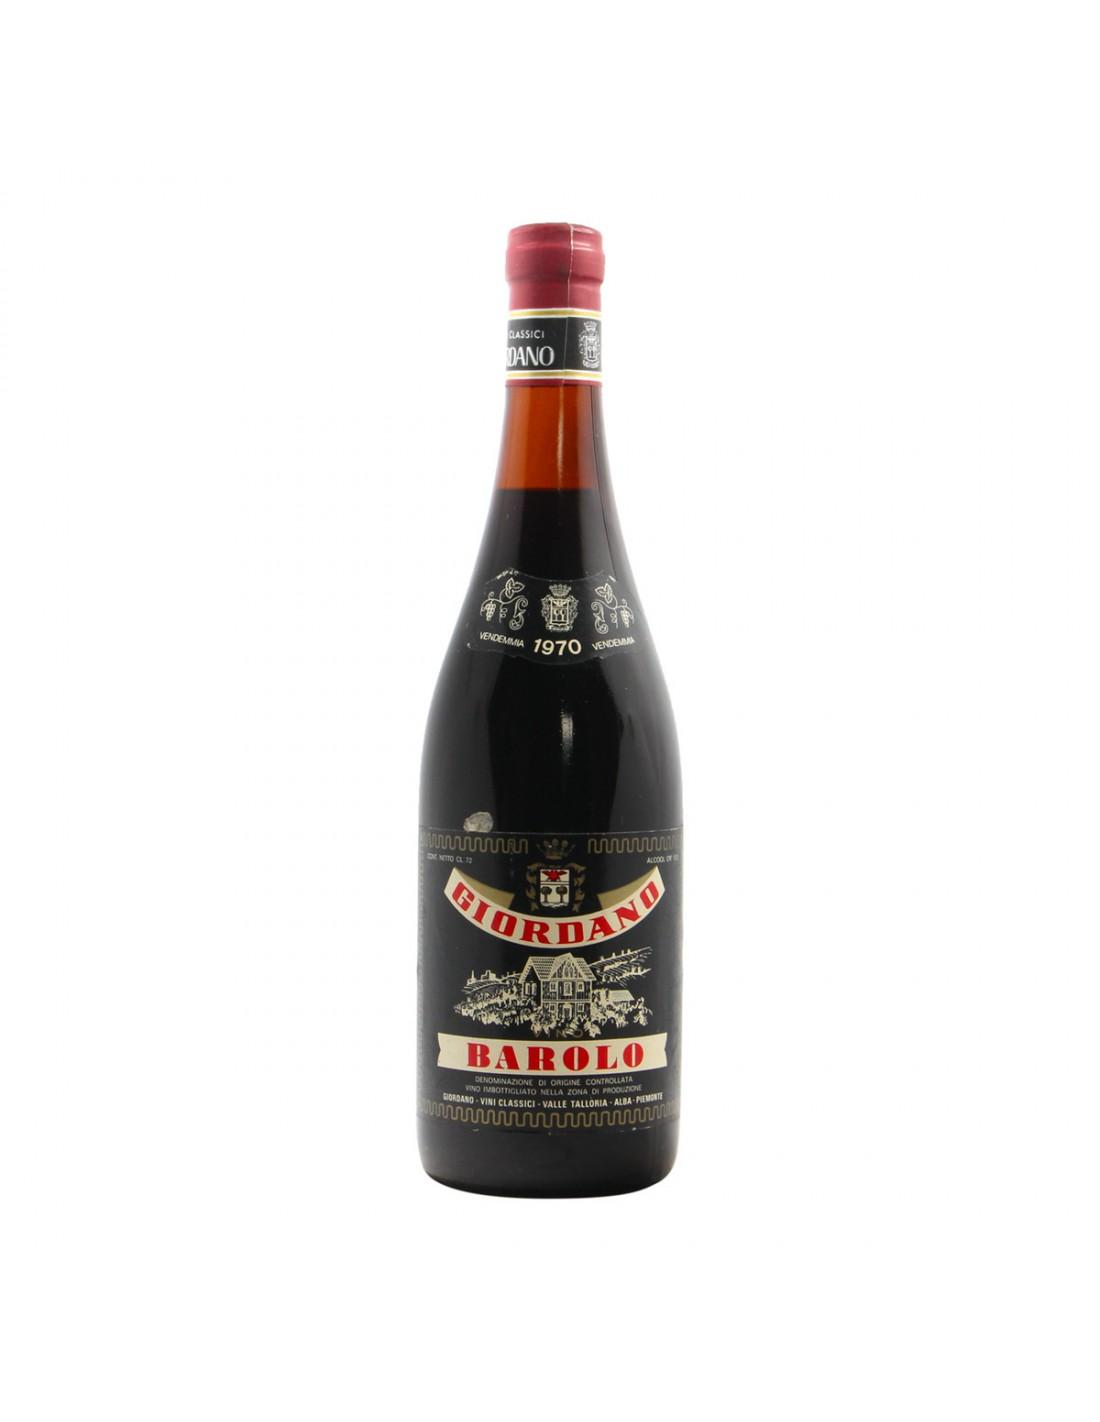 BAROLO 1970 GIORDANO Grandi Bottiglie